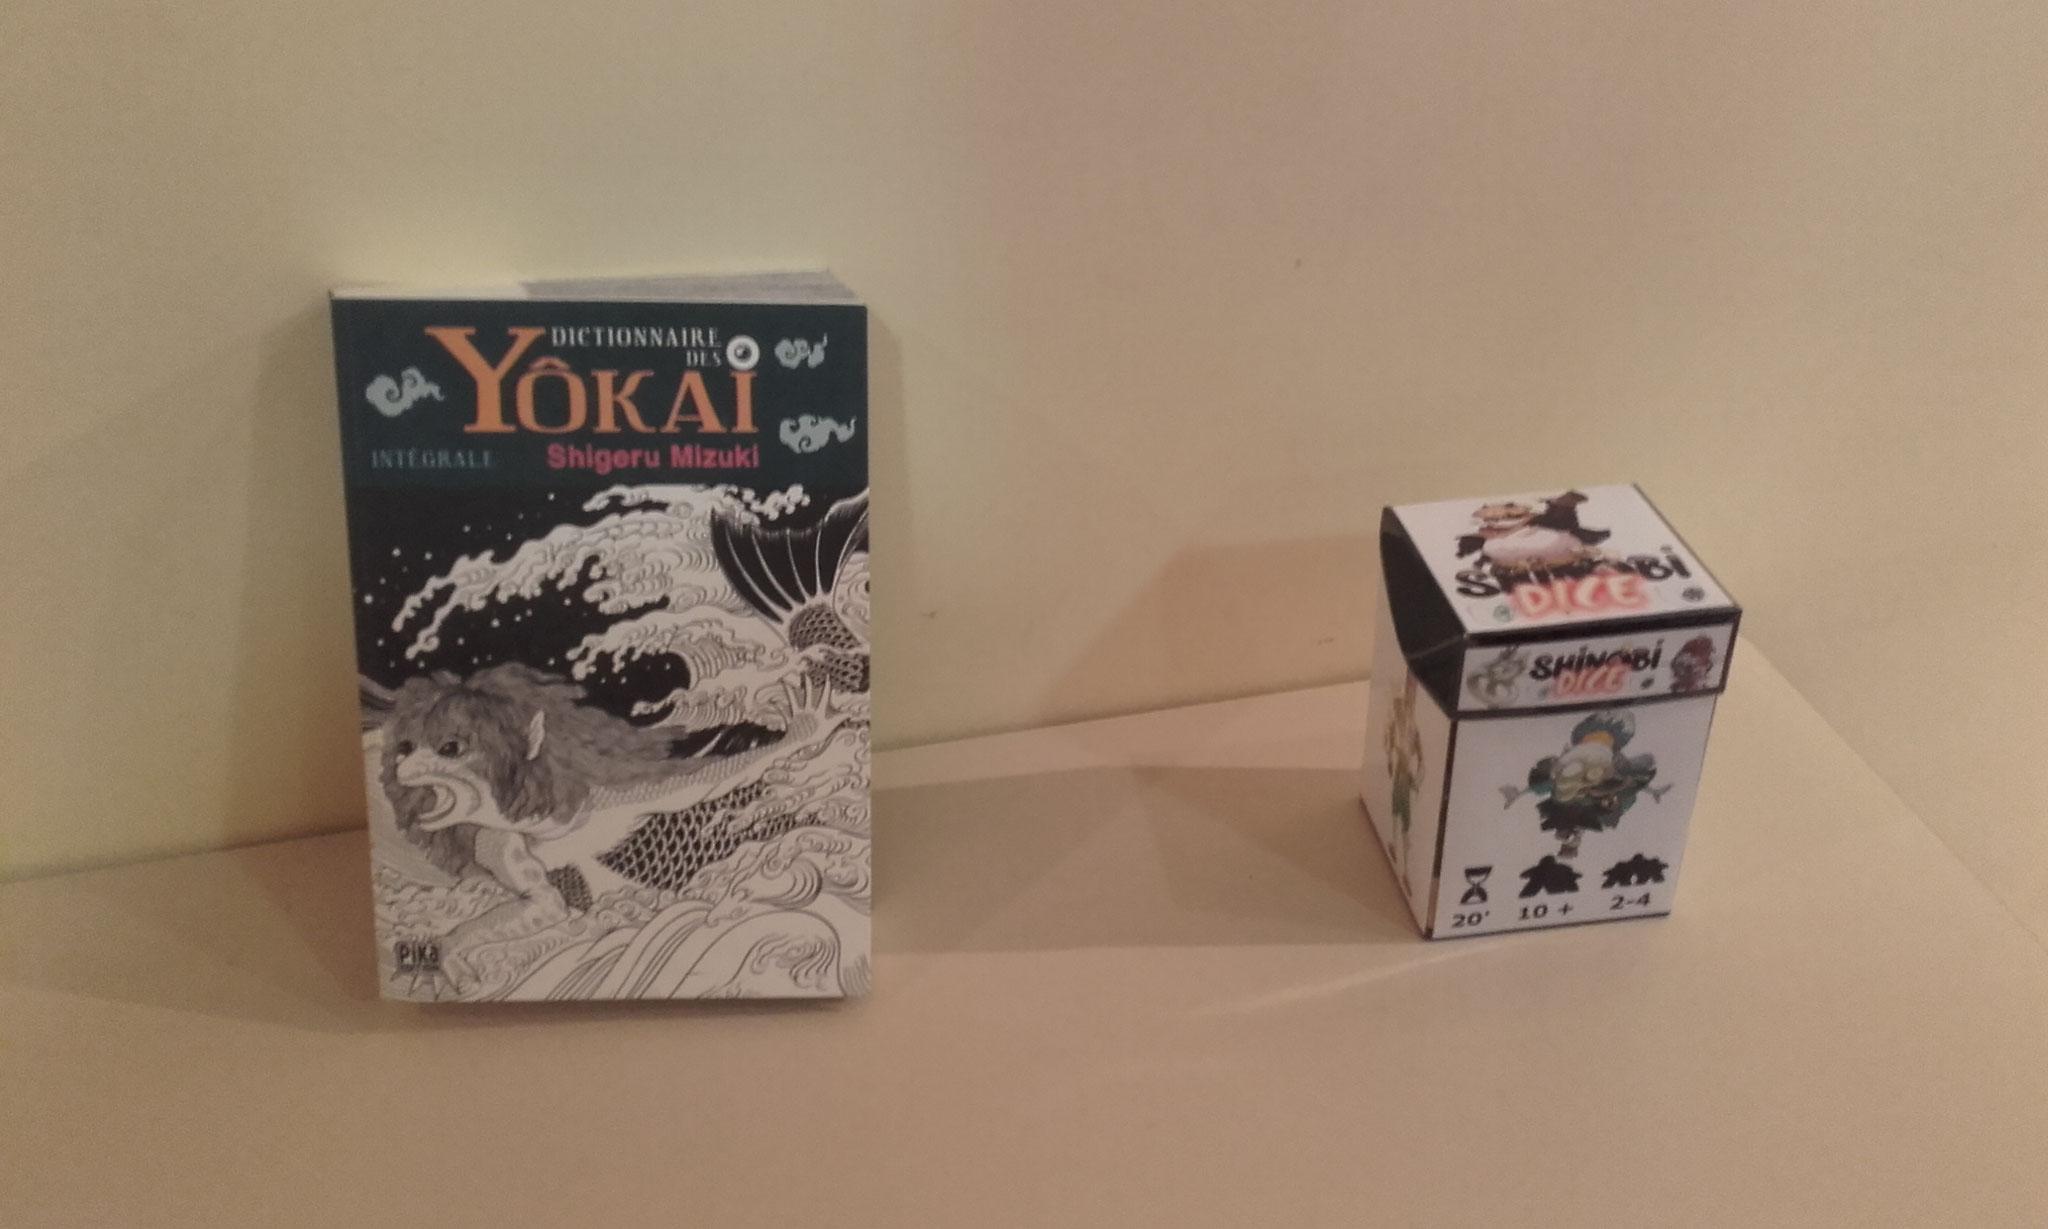 le dictionnaire des Yokai de Shigeru Mizuki